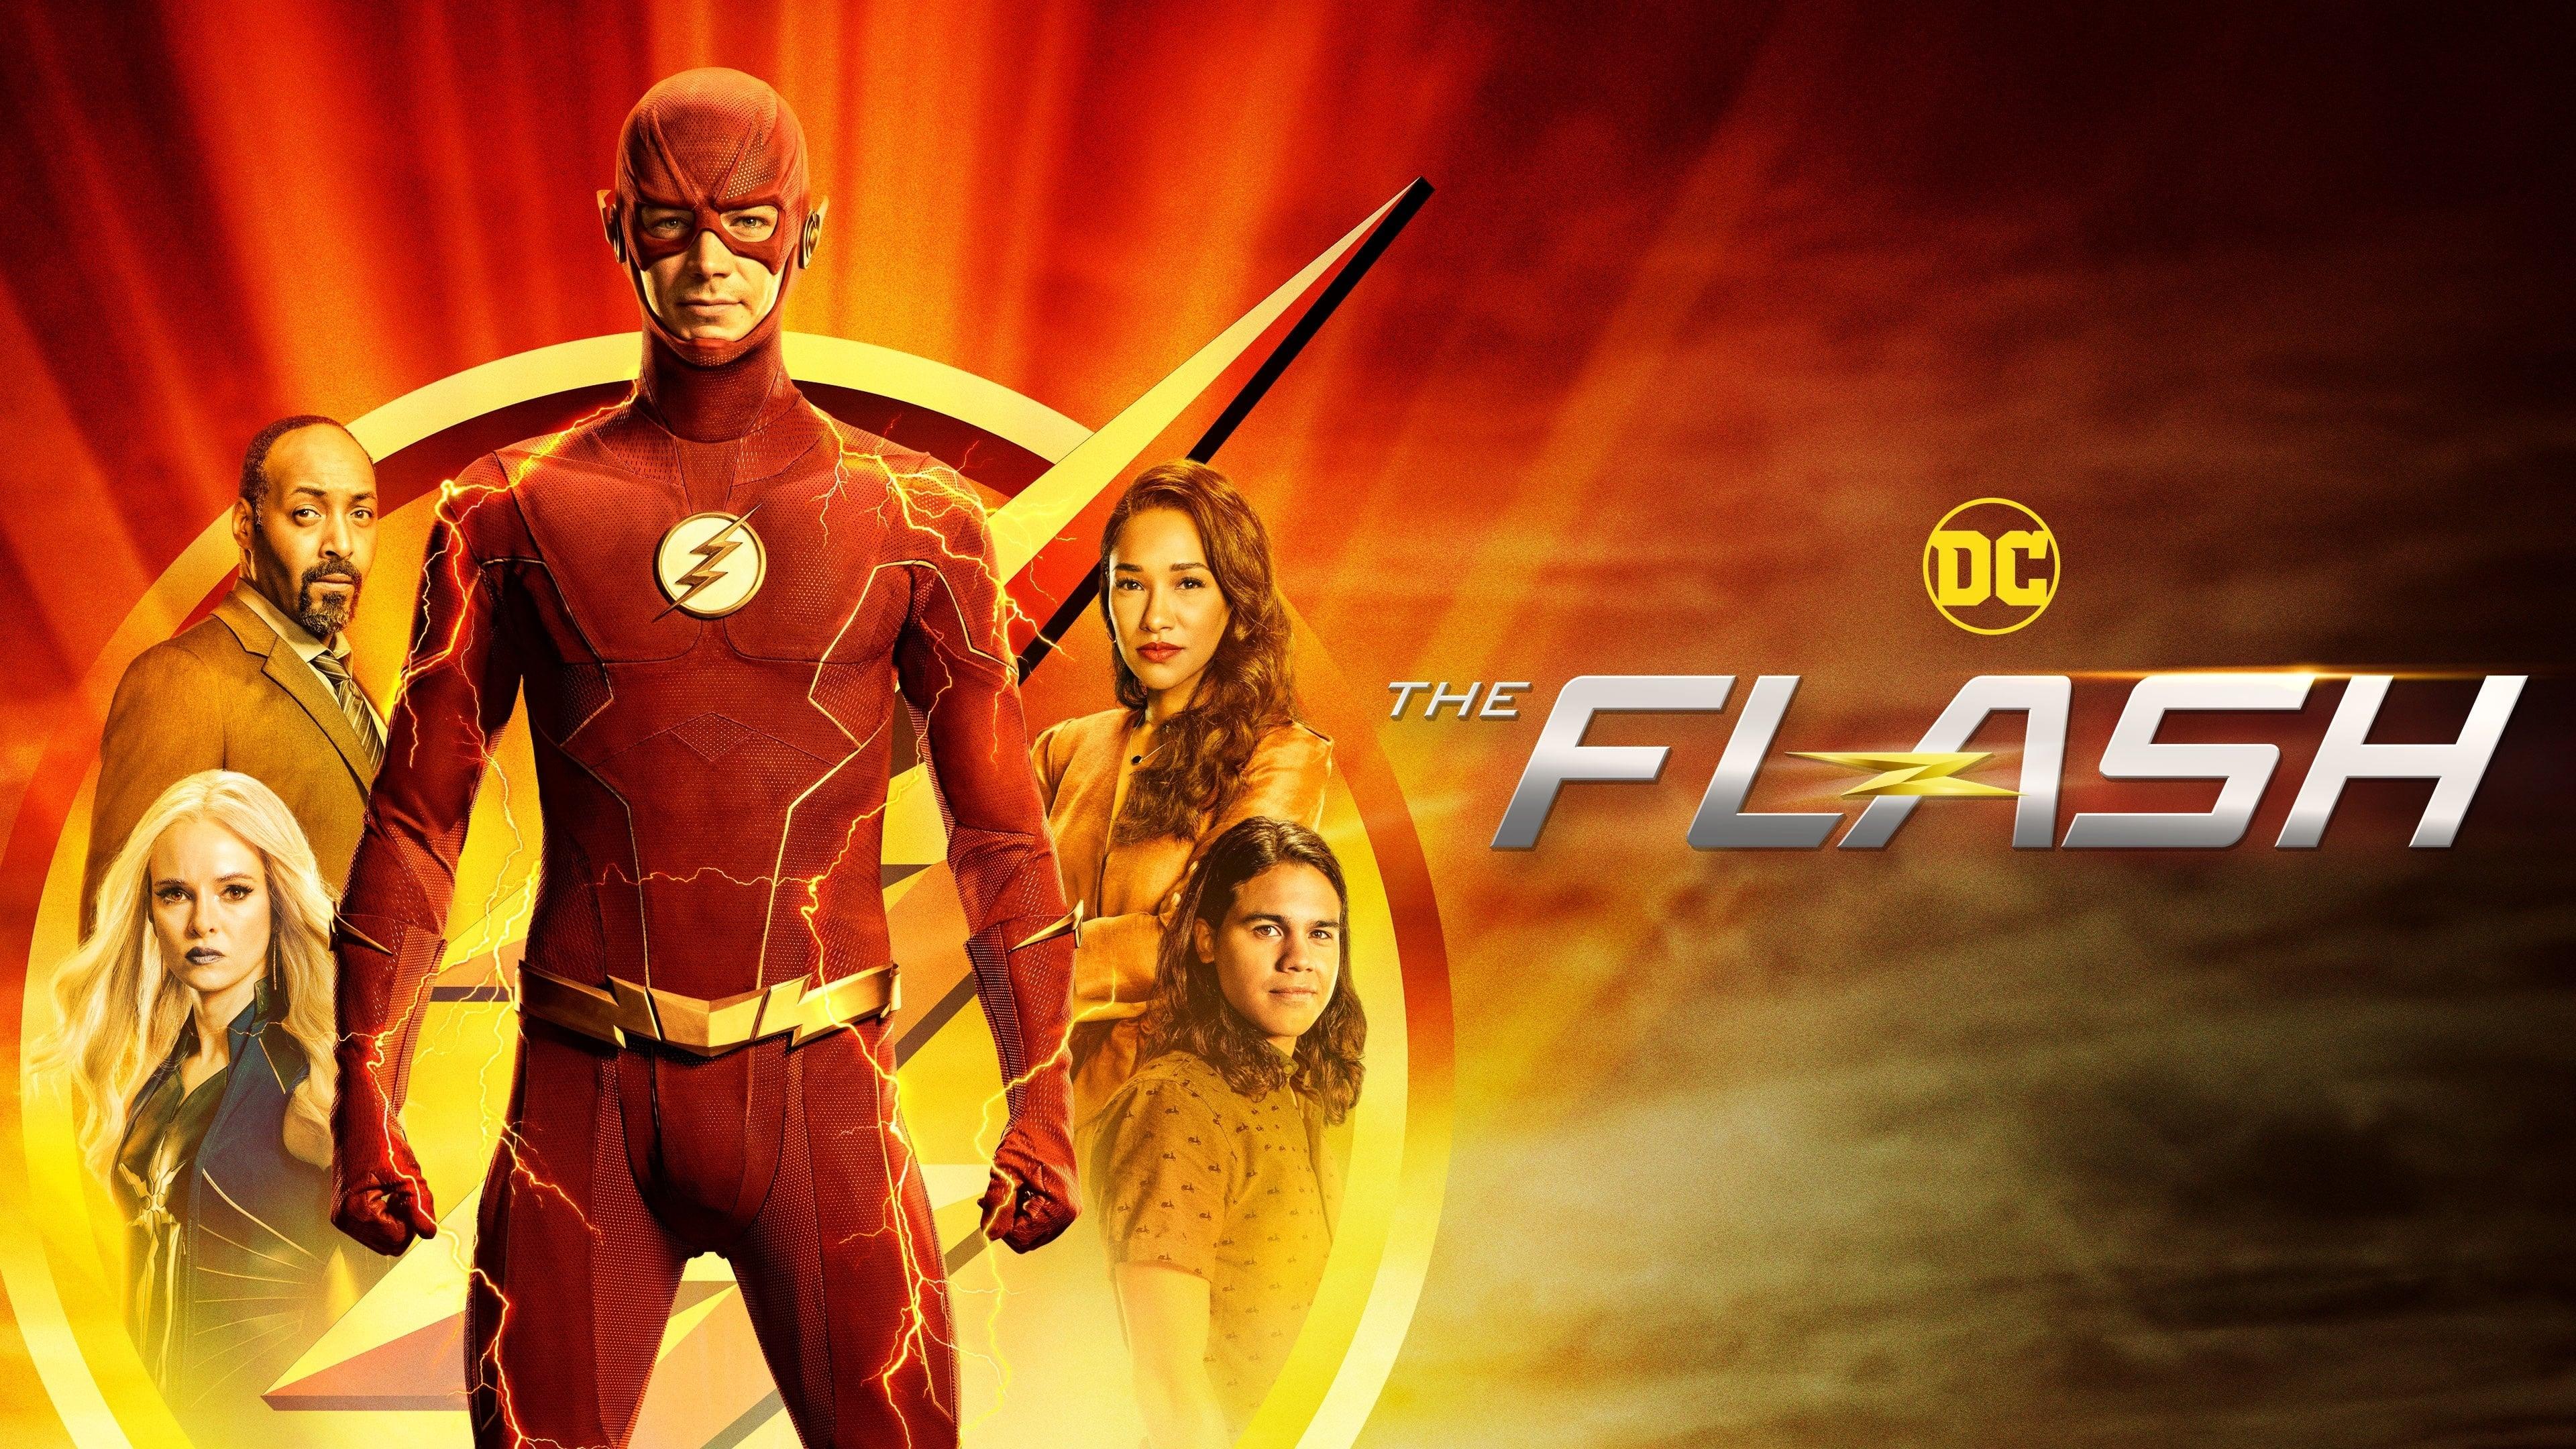 The Flash (1970)